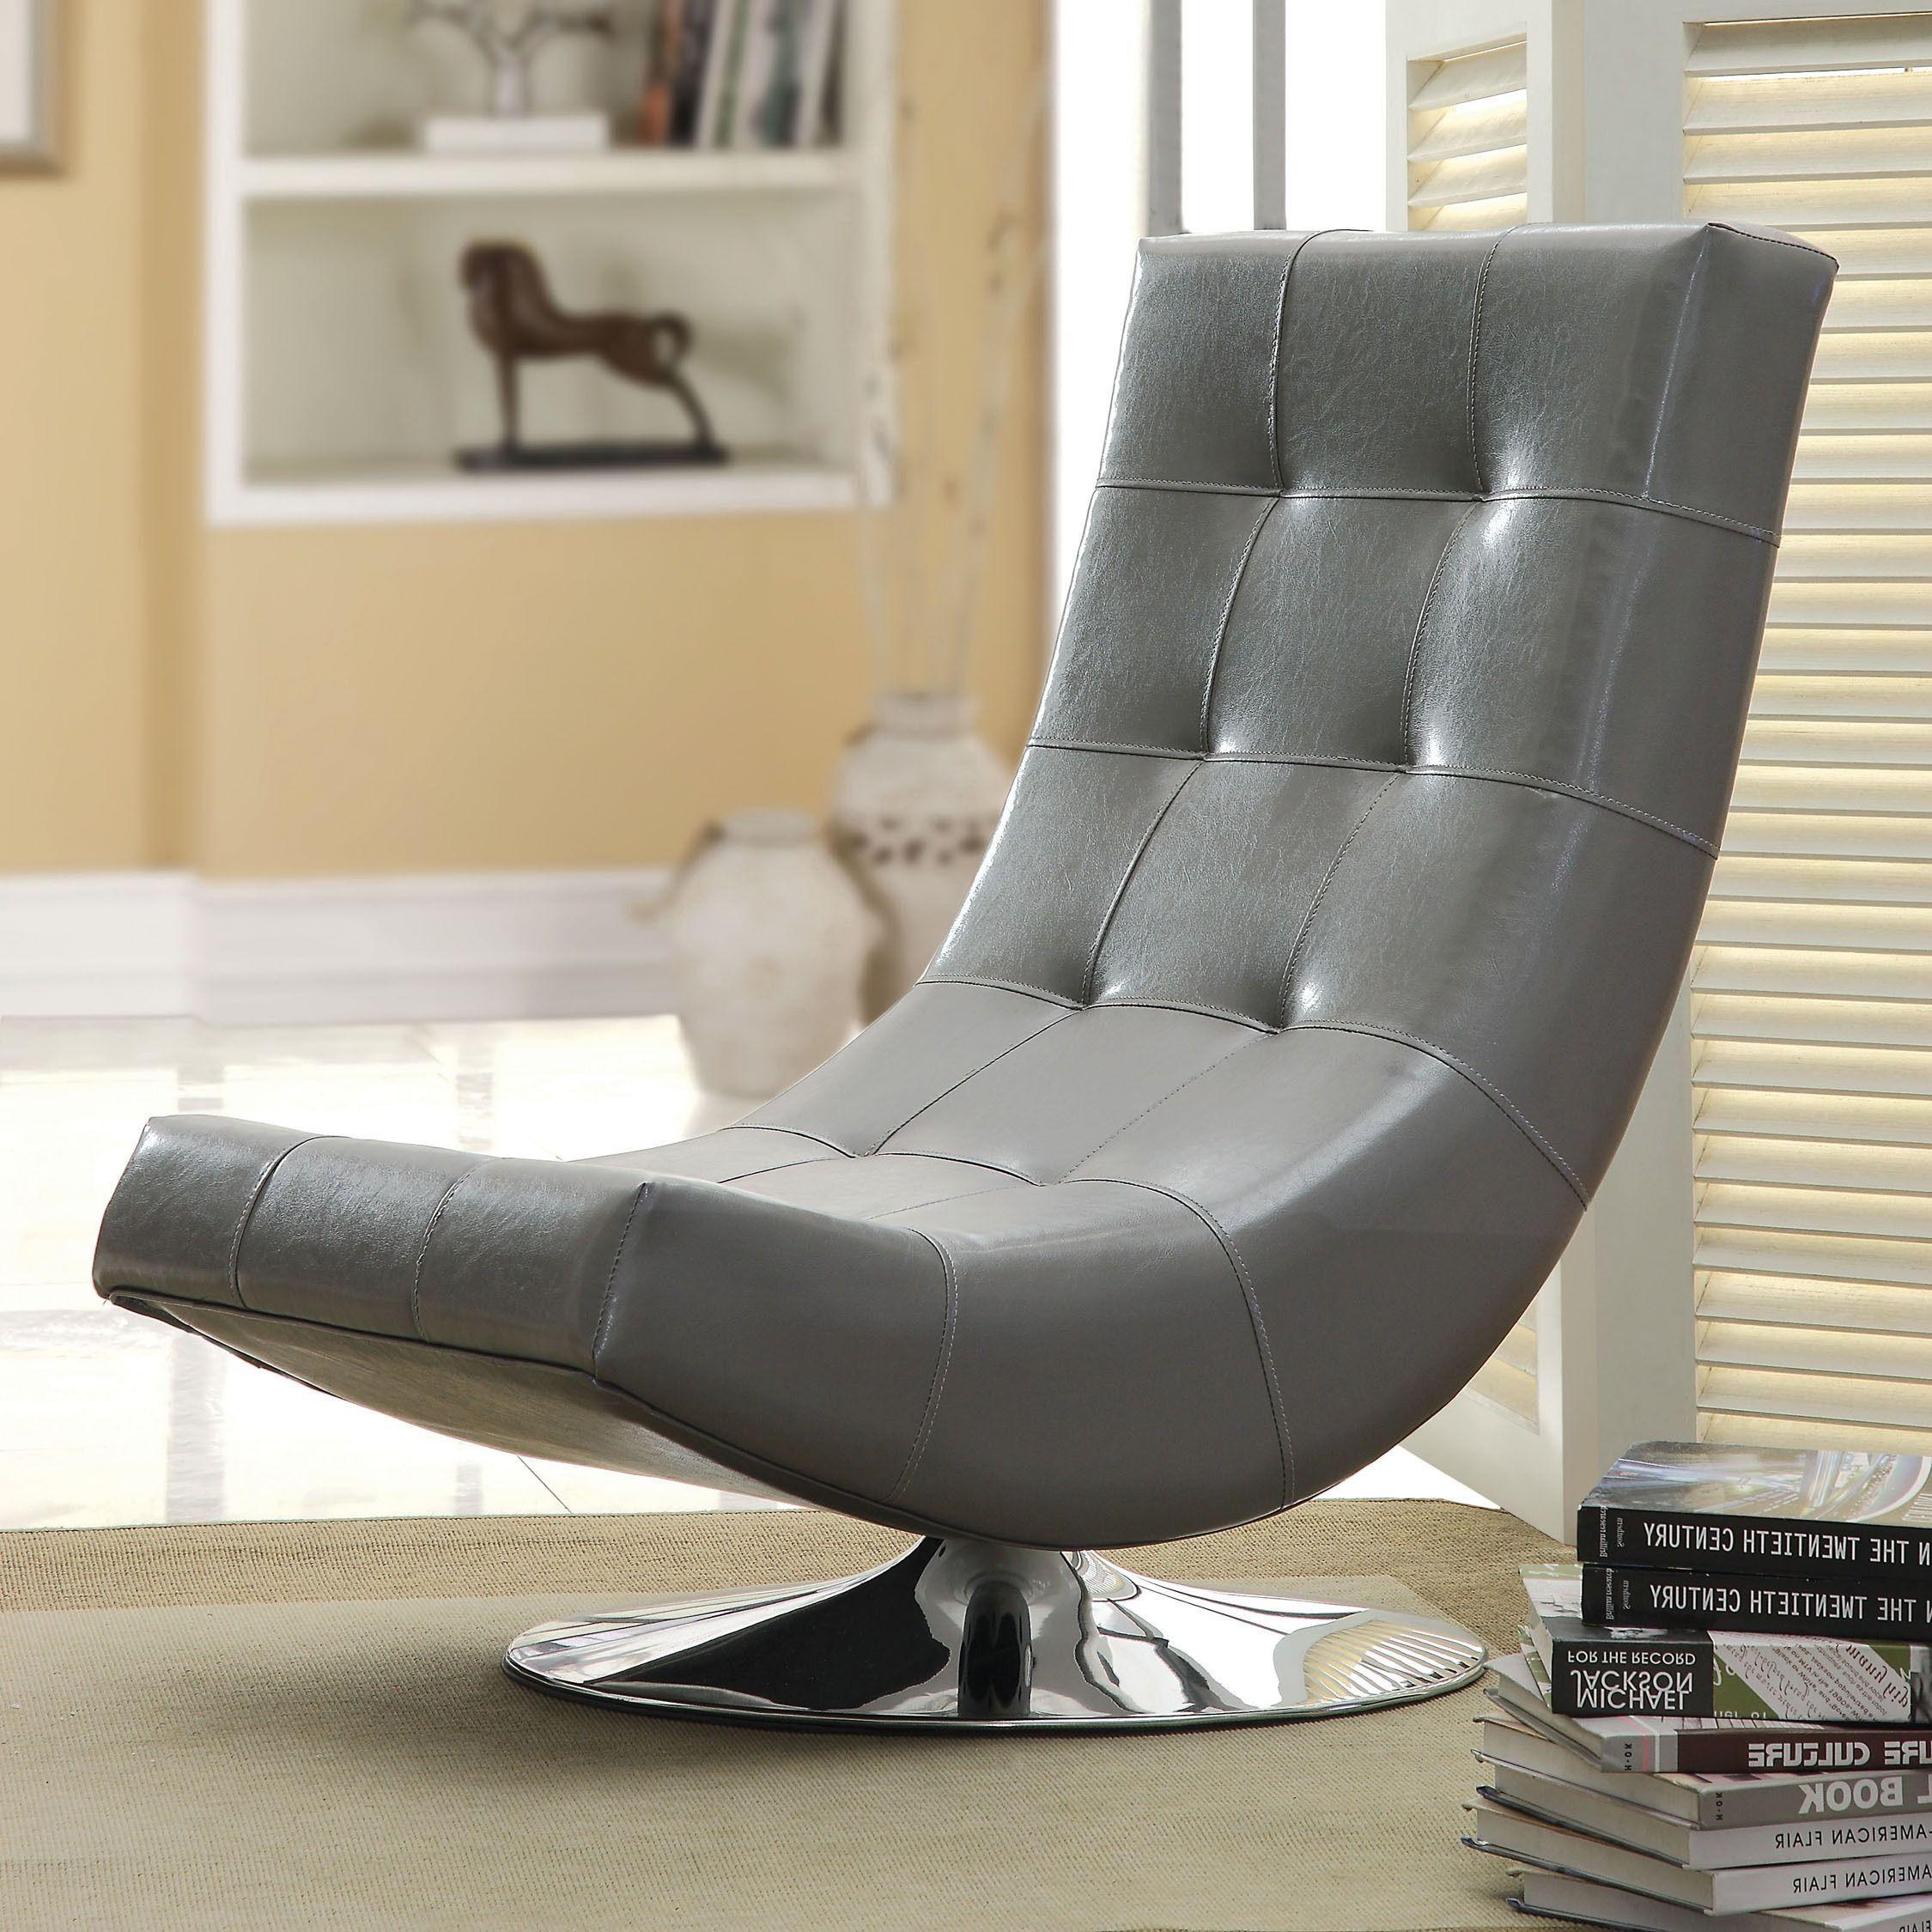 Marvelous Online Shopping Bedding Furniture Electronics Jewelry Short Links Chair Design For Home Short Linksinfo